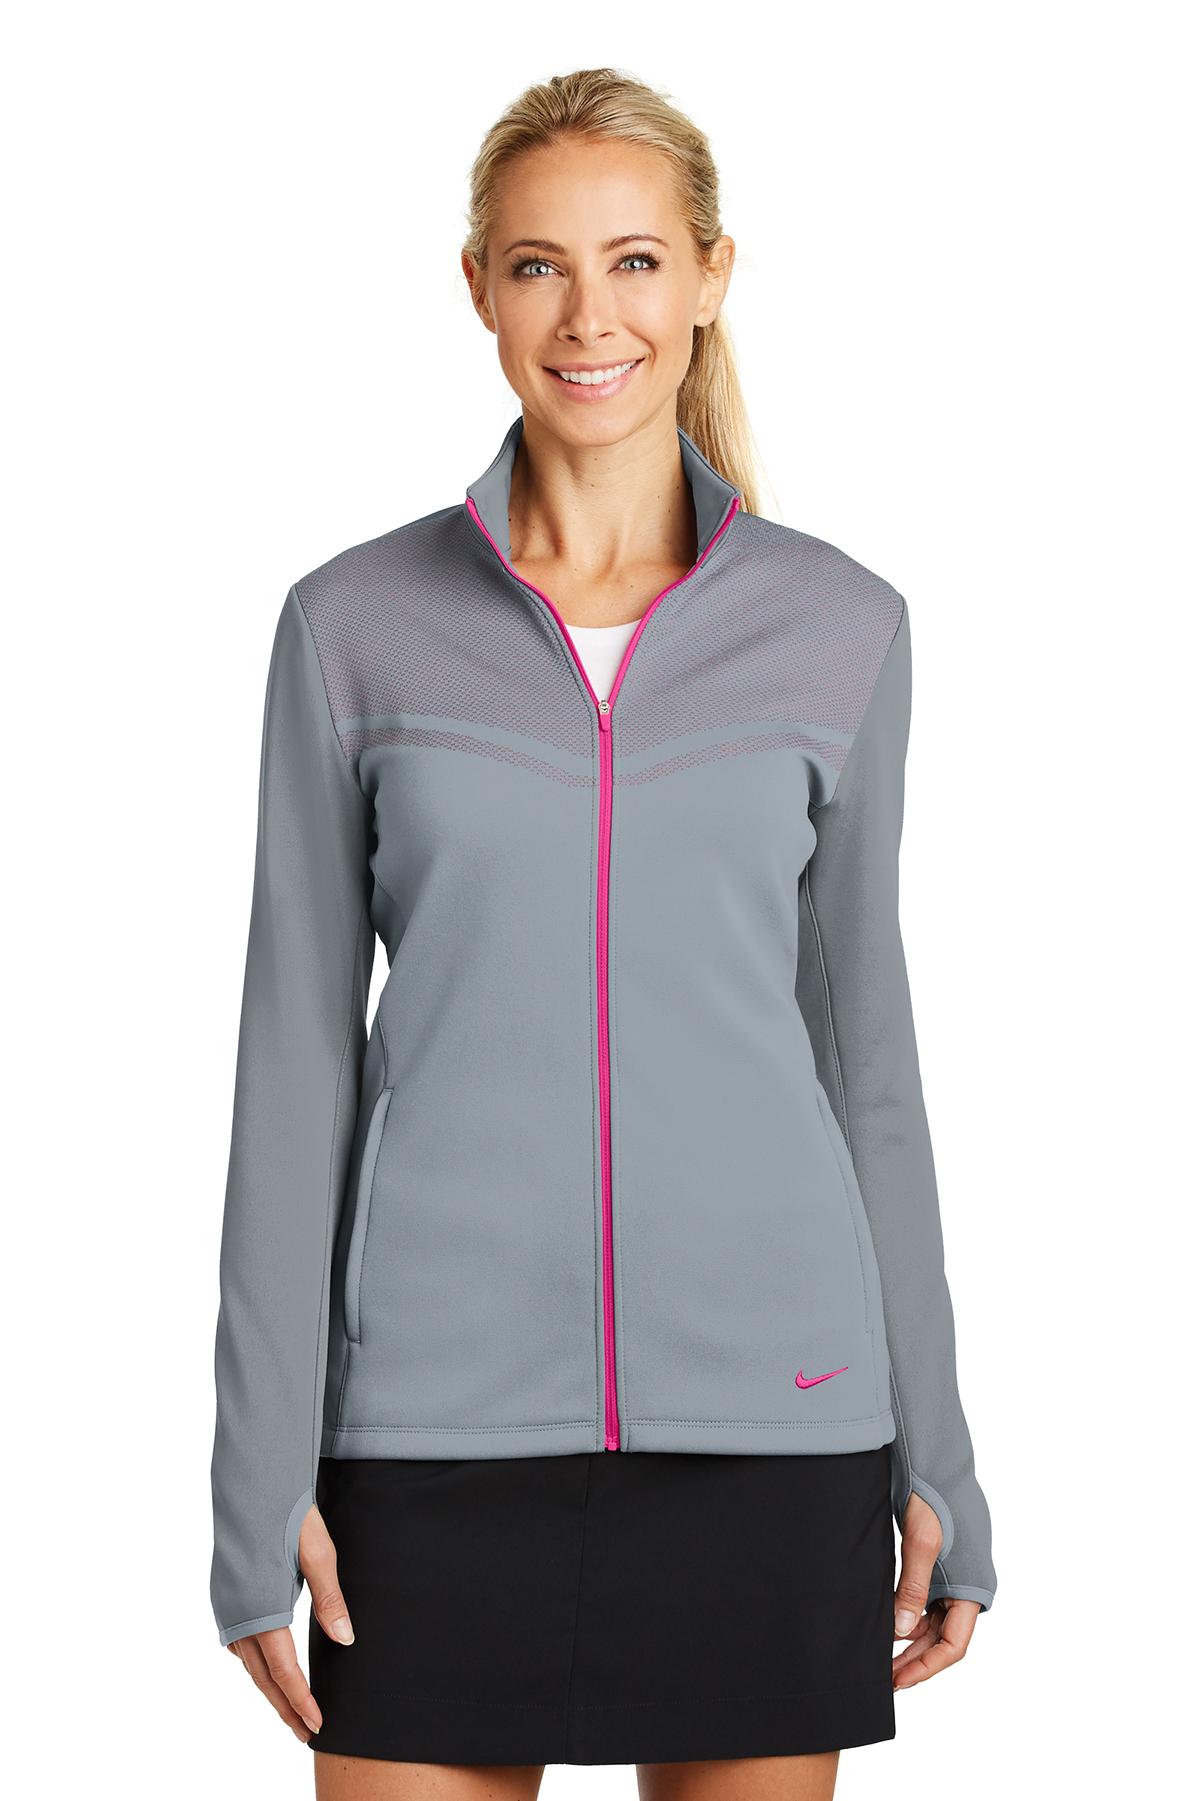 Ladies Cotton Zip Jacket Size 10-24